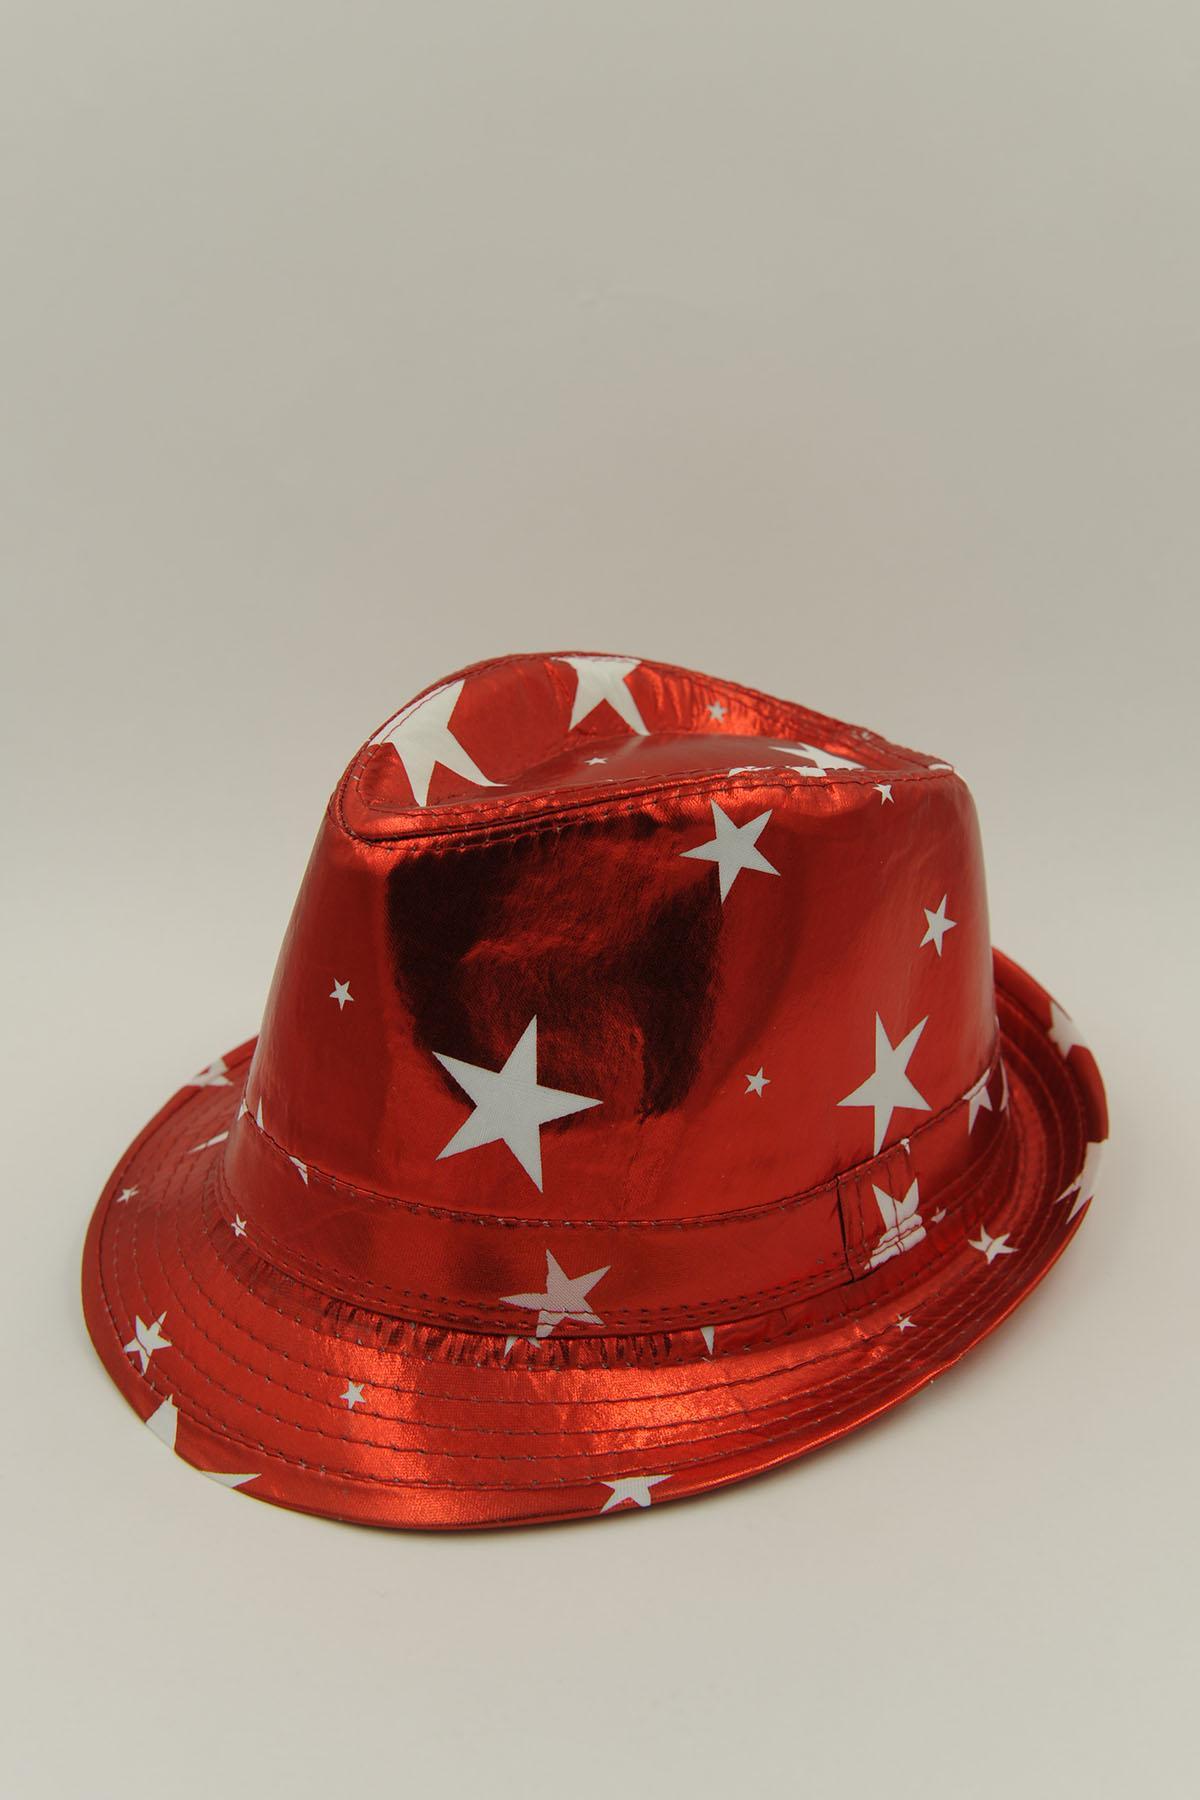 Sombreros Accessori Red CALISTAR CHAPEAU NOEL #c eFashion Paris